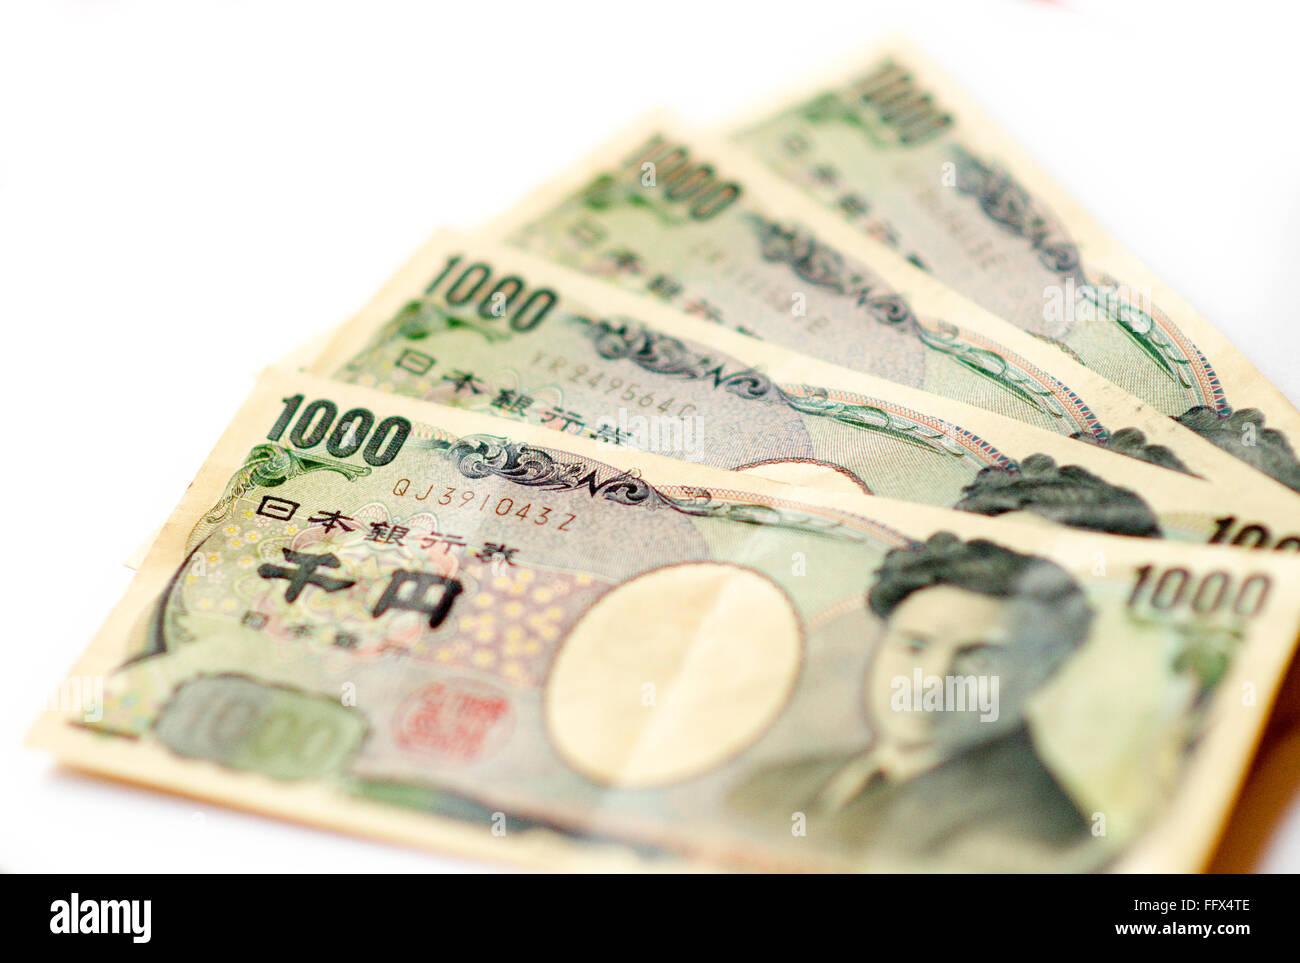 1000 yen notes on a white background. Stock Photo